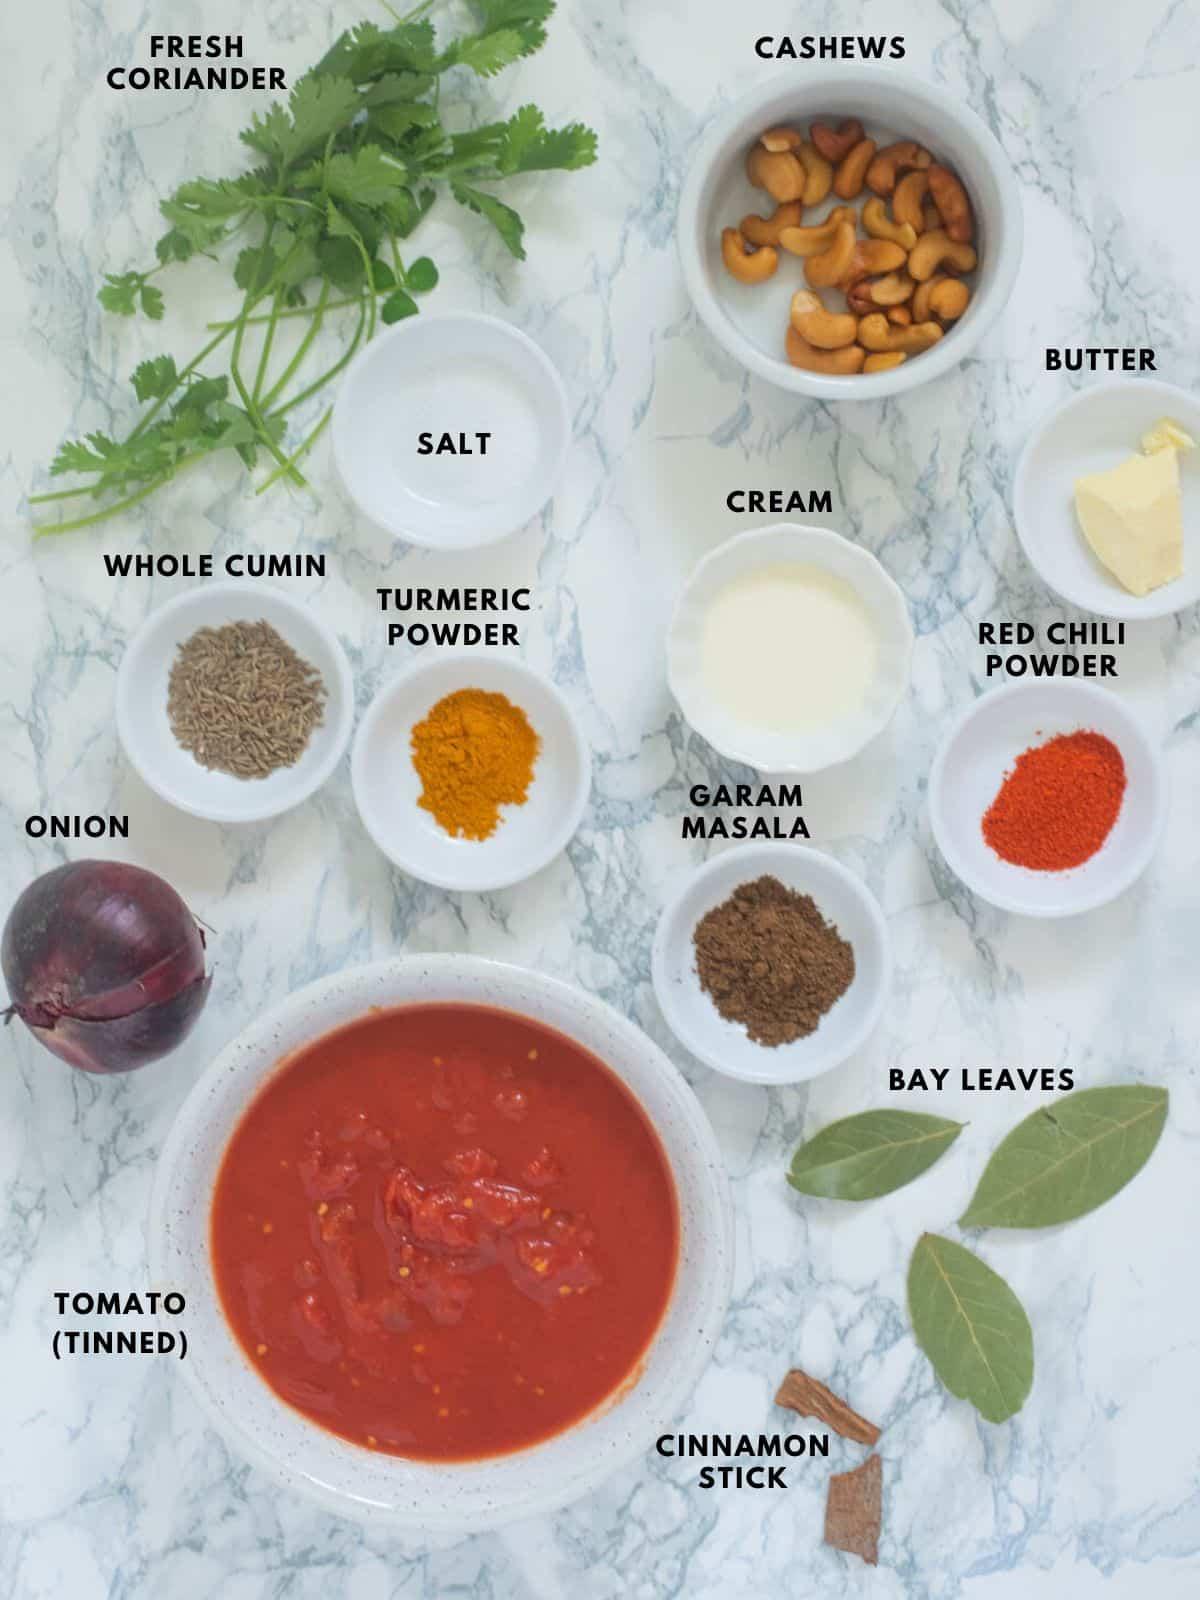 Ingredients for Chicken Tikka Masala sauce